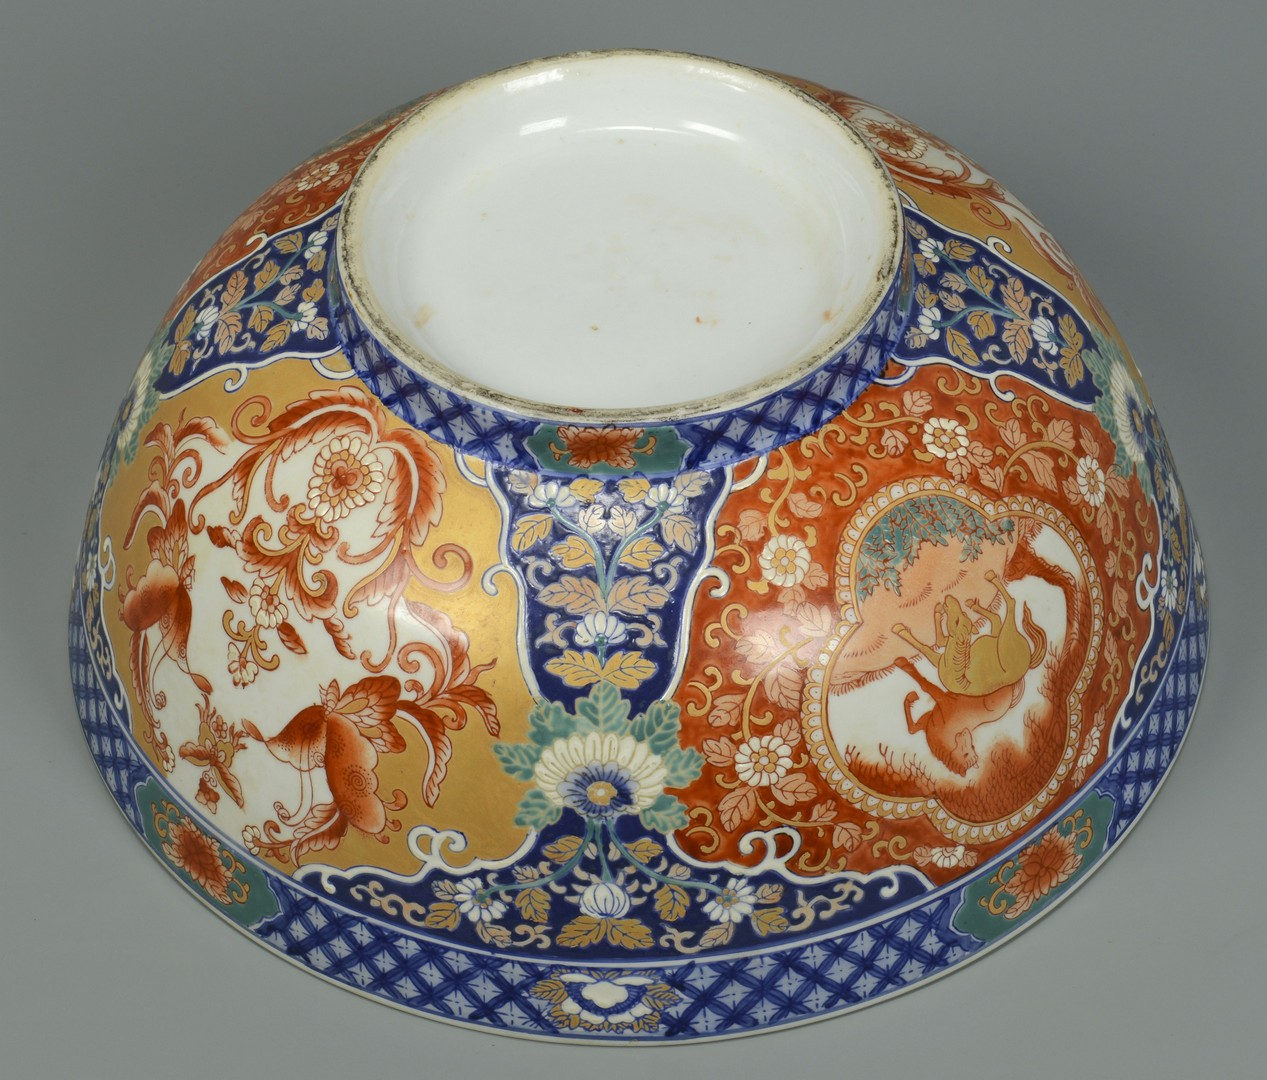 Lot 3383227: Large Chinese Porcelain Punchbowl